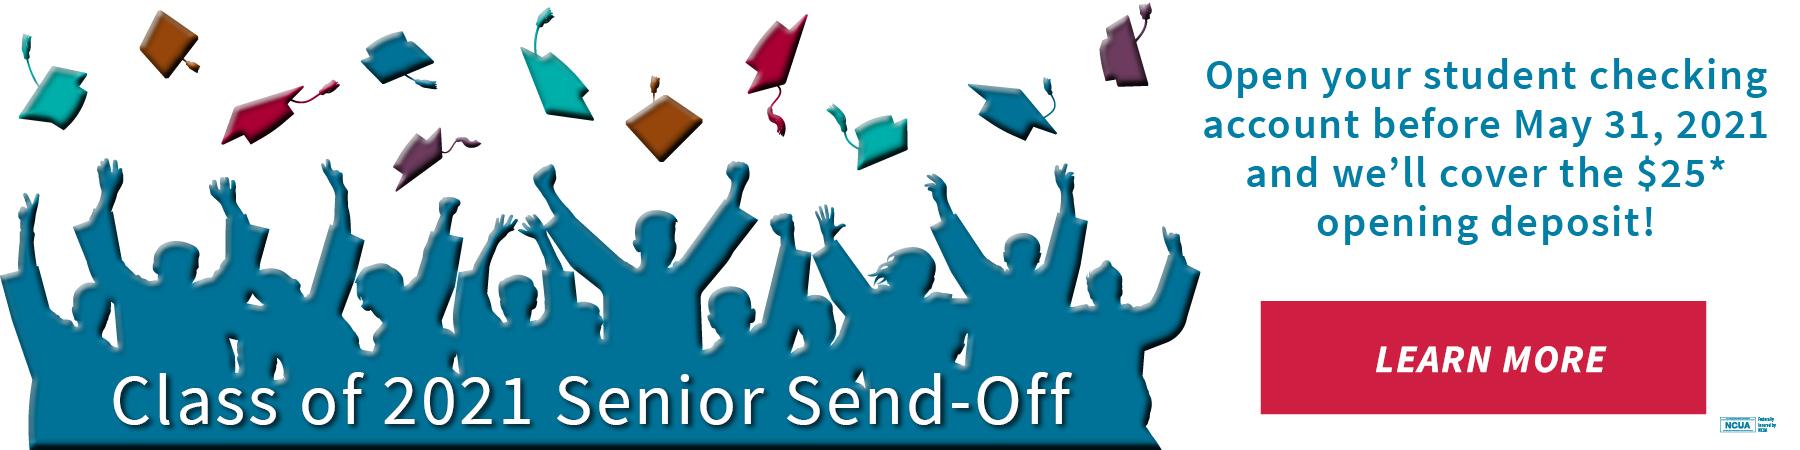 Class of 2021 Senior Send-Off